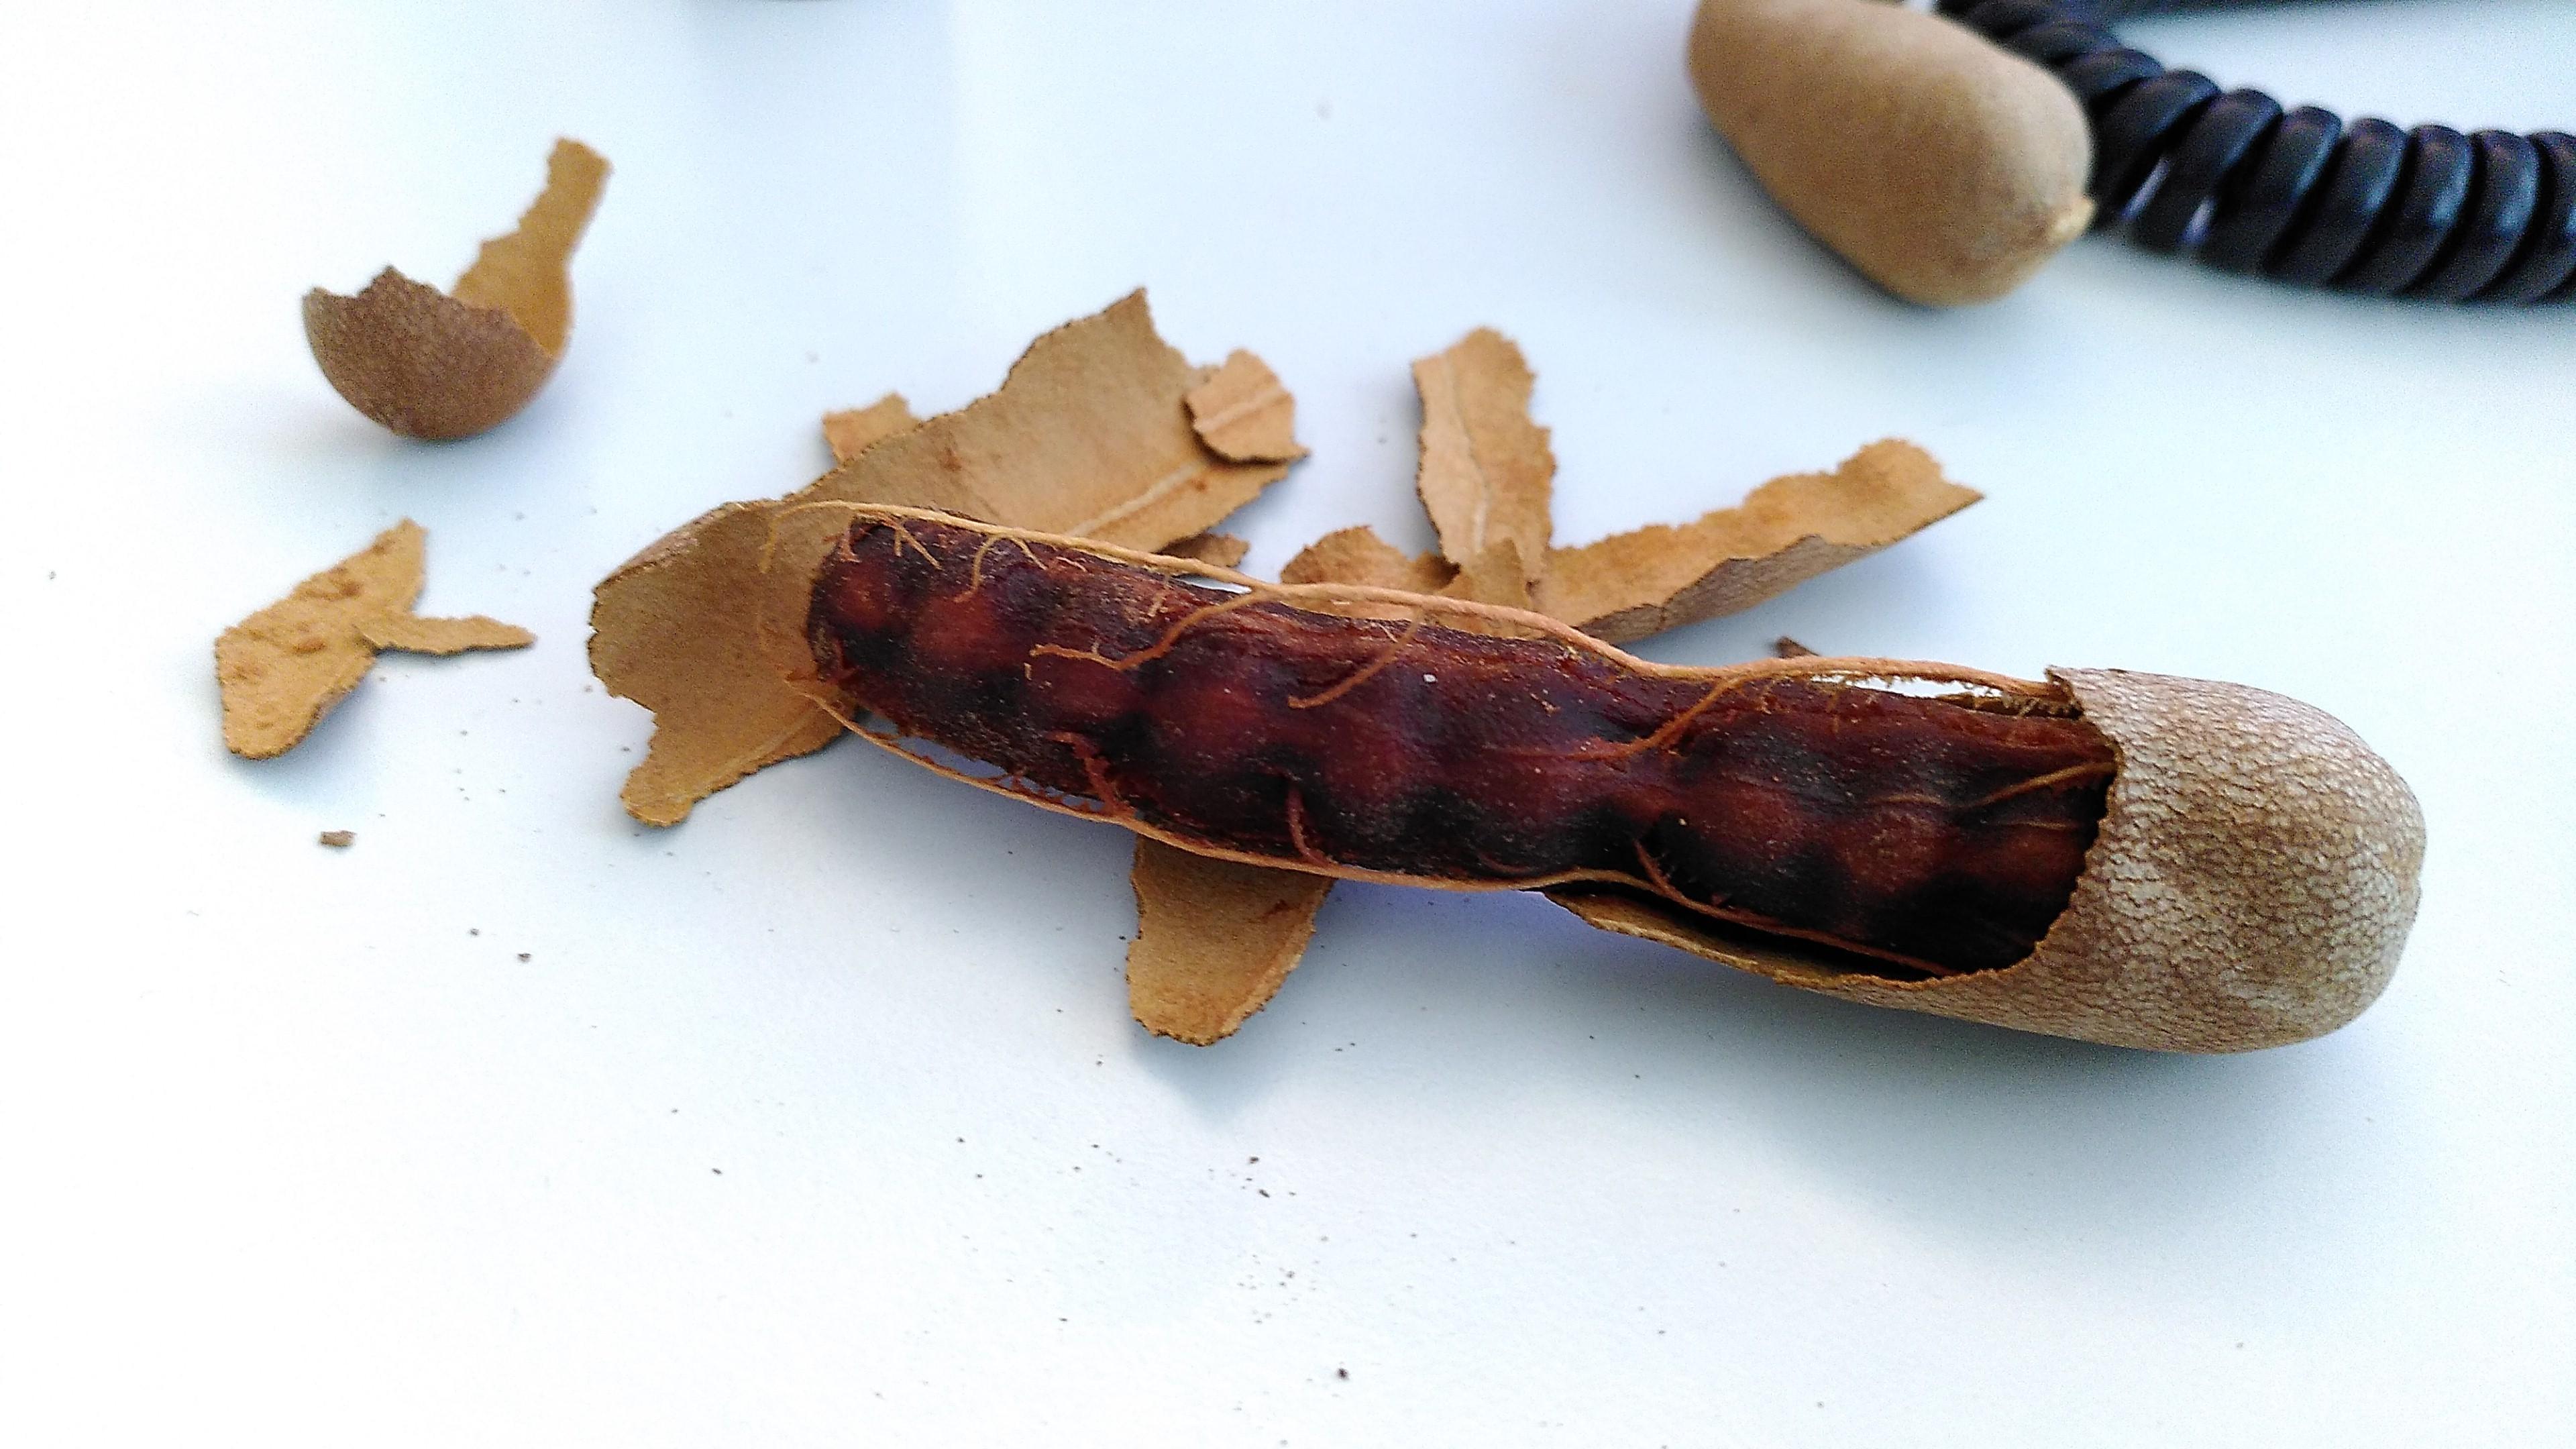 Teilweise geöffnete hellbraune Tamarinden-Hülse mit freigelegtem dunkelbraunen Fruchtfleisch. Optisch erinnert es an Kot.